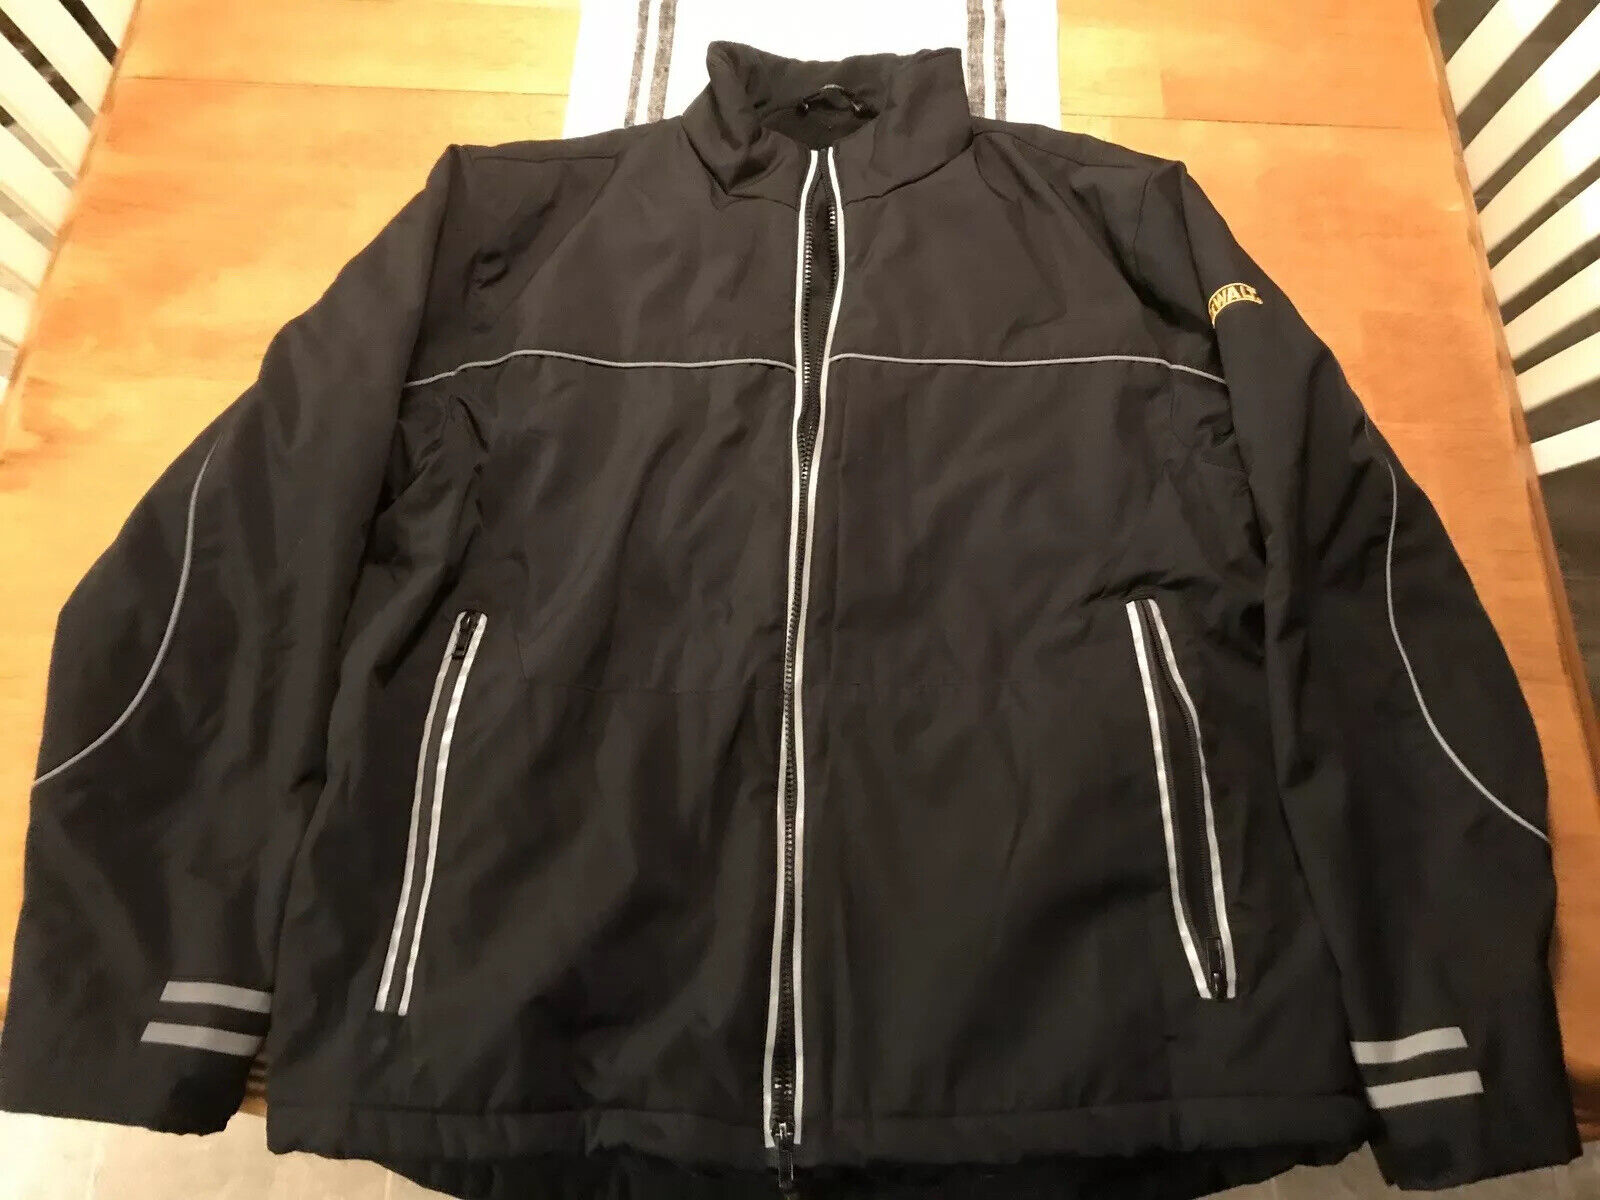 DEWALT DCHJ064C1-L 20V//12V MAX* Lithium Ion Khaki Hooded Heated Jacket Kit Size